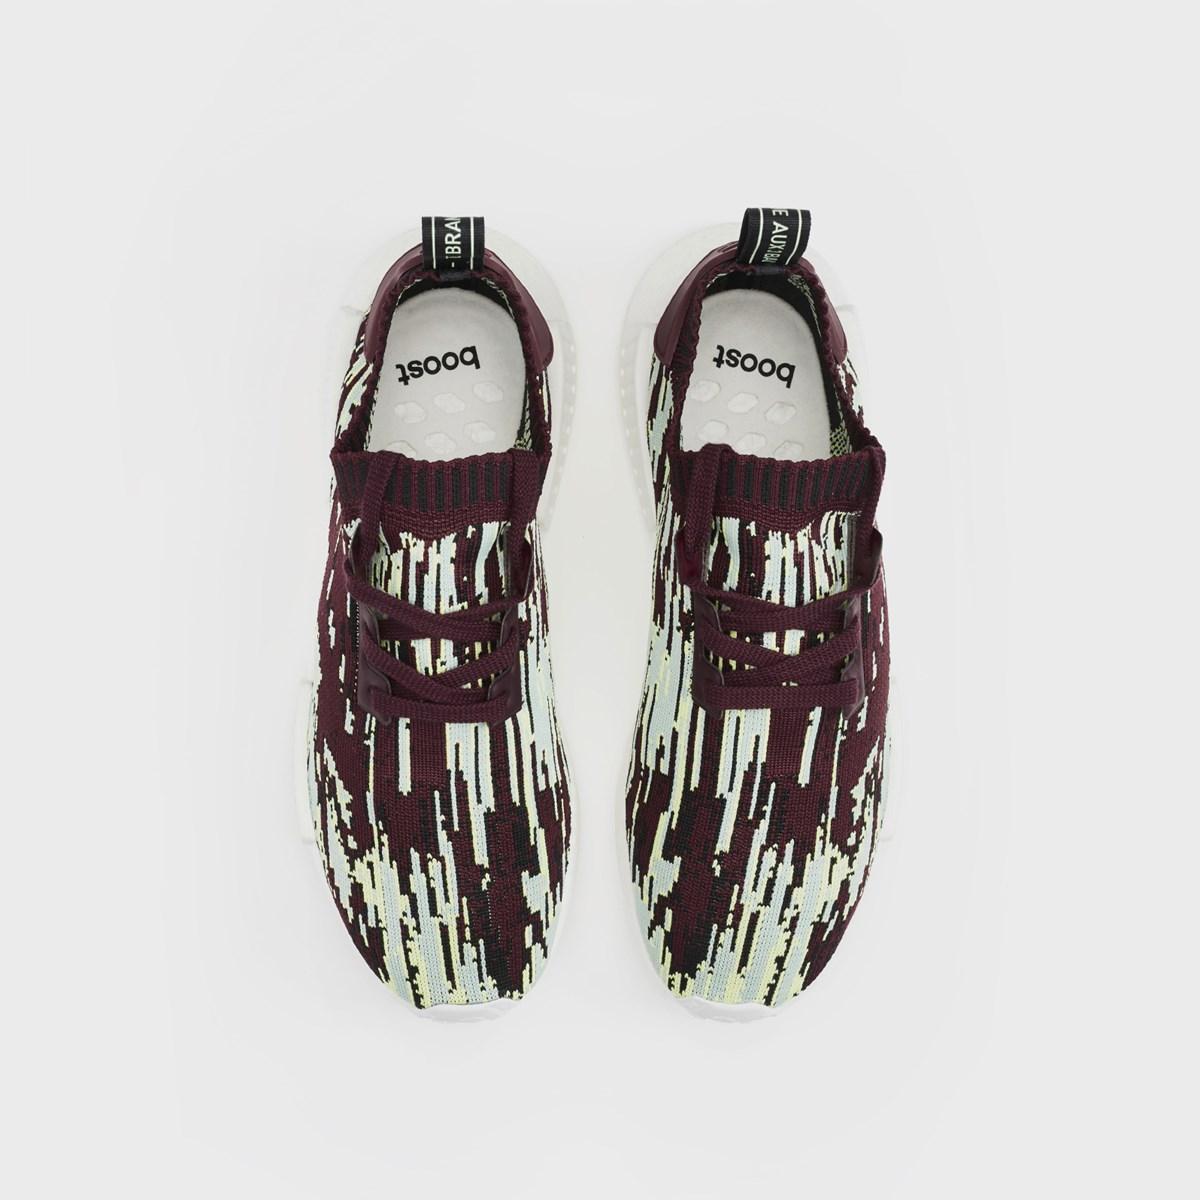 adidas NMD R1 PK Datamosh - Db2843 - SNS   sneakers & streetwear online since 1999